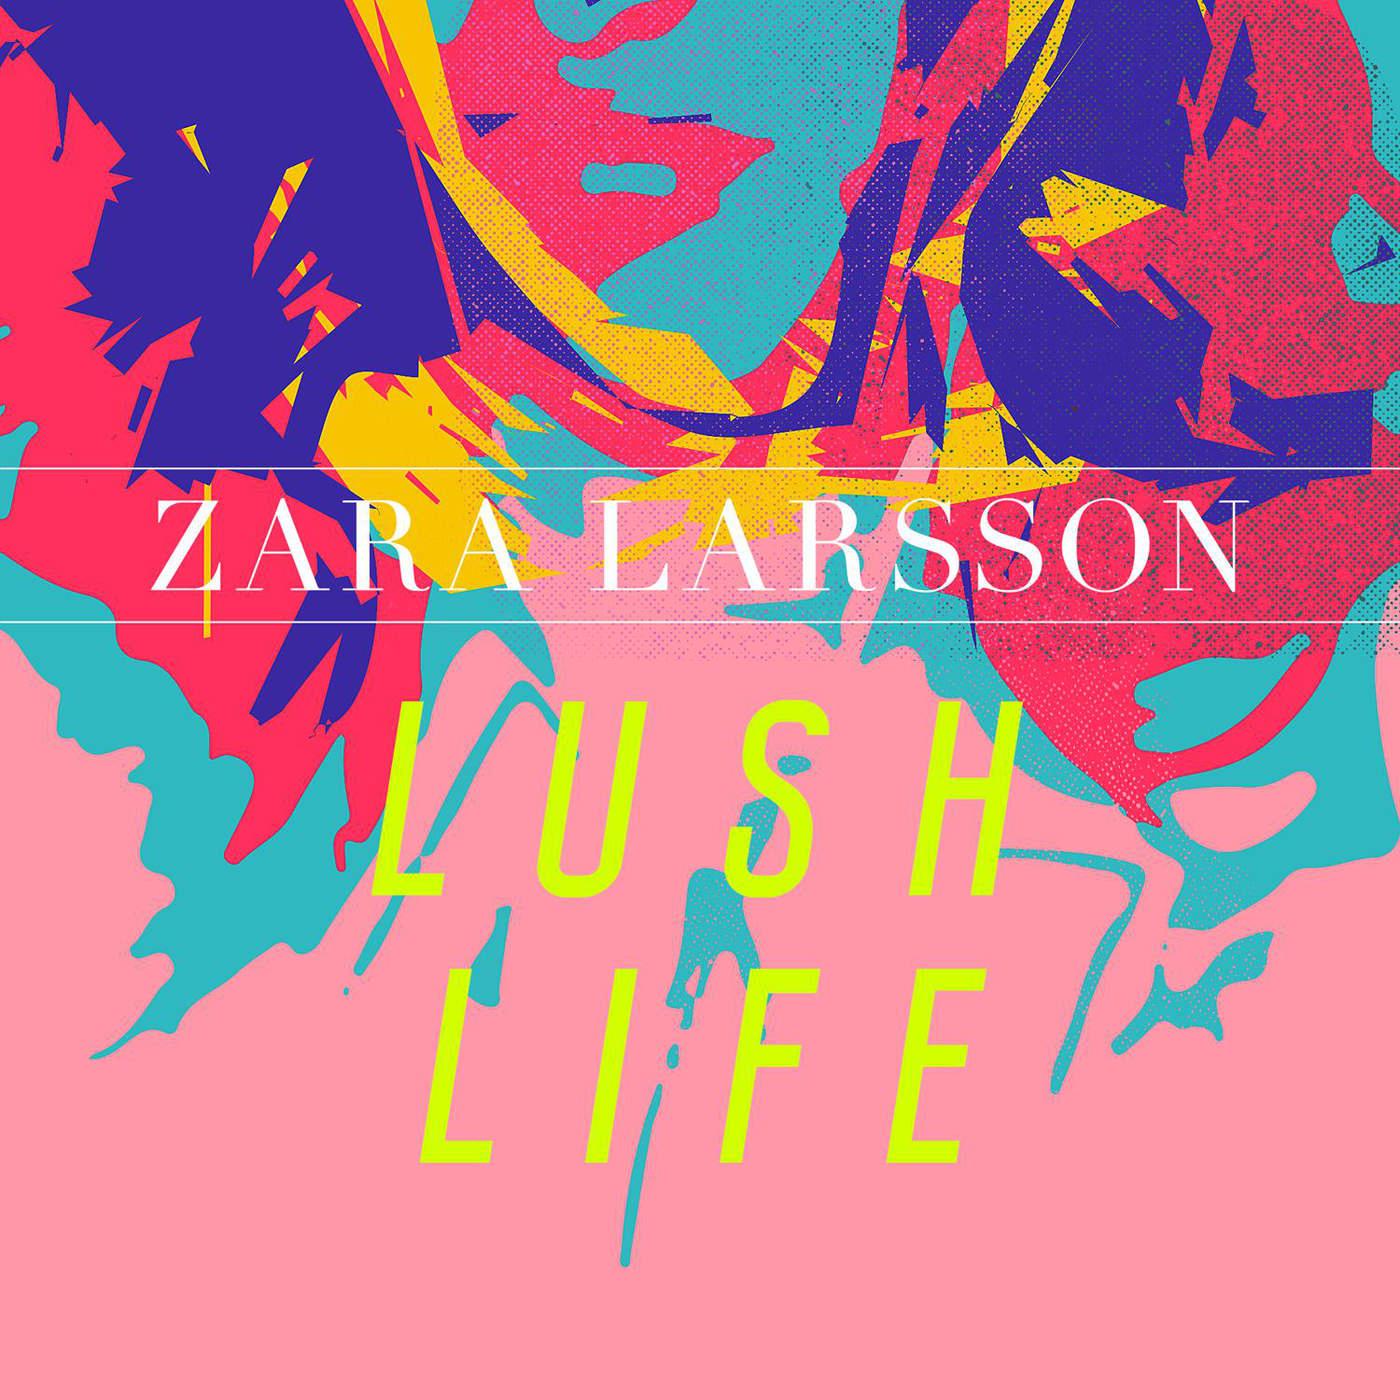 Zara Larsson - Lush Life - Single Cover